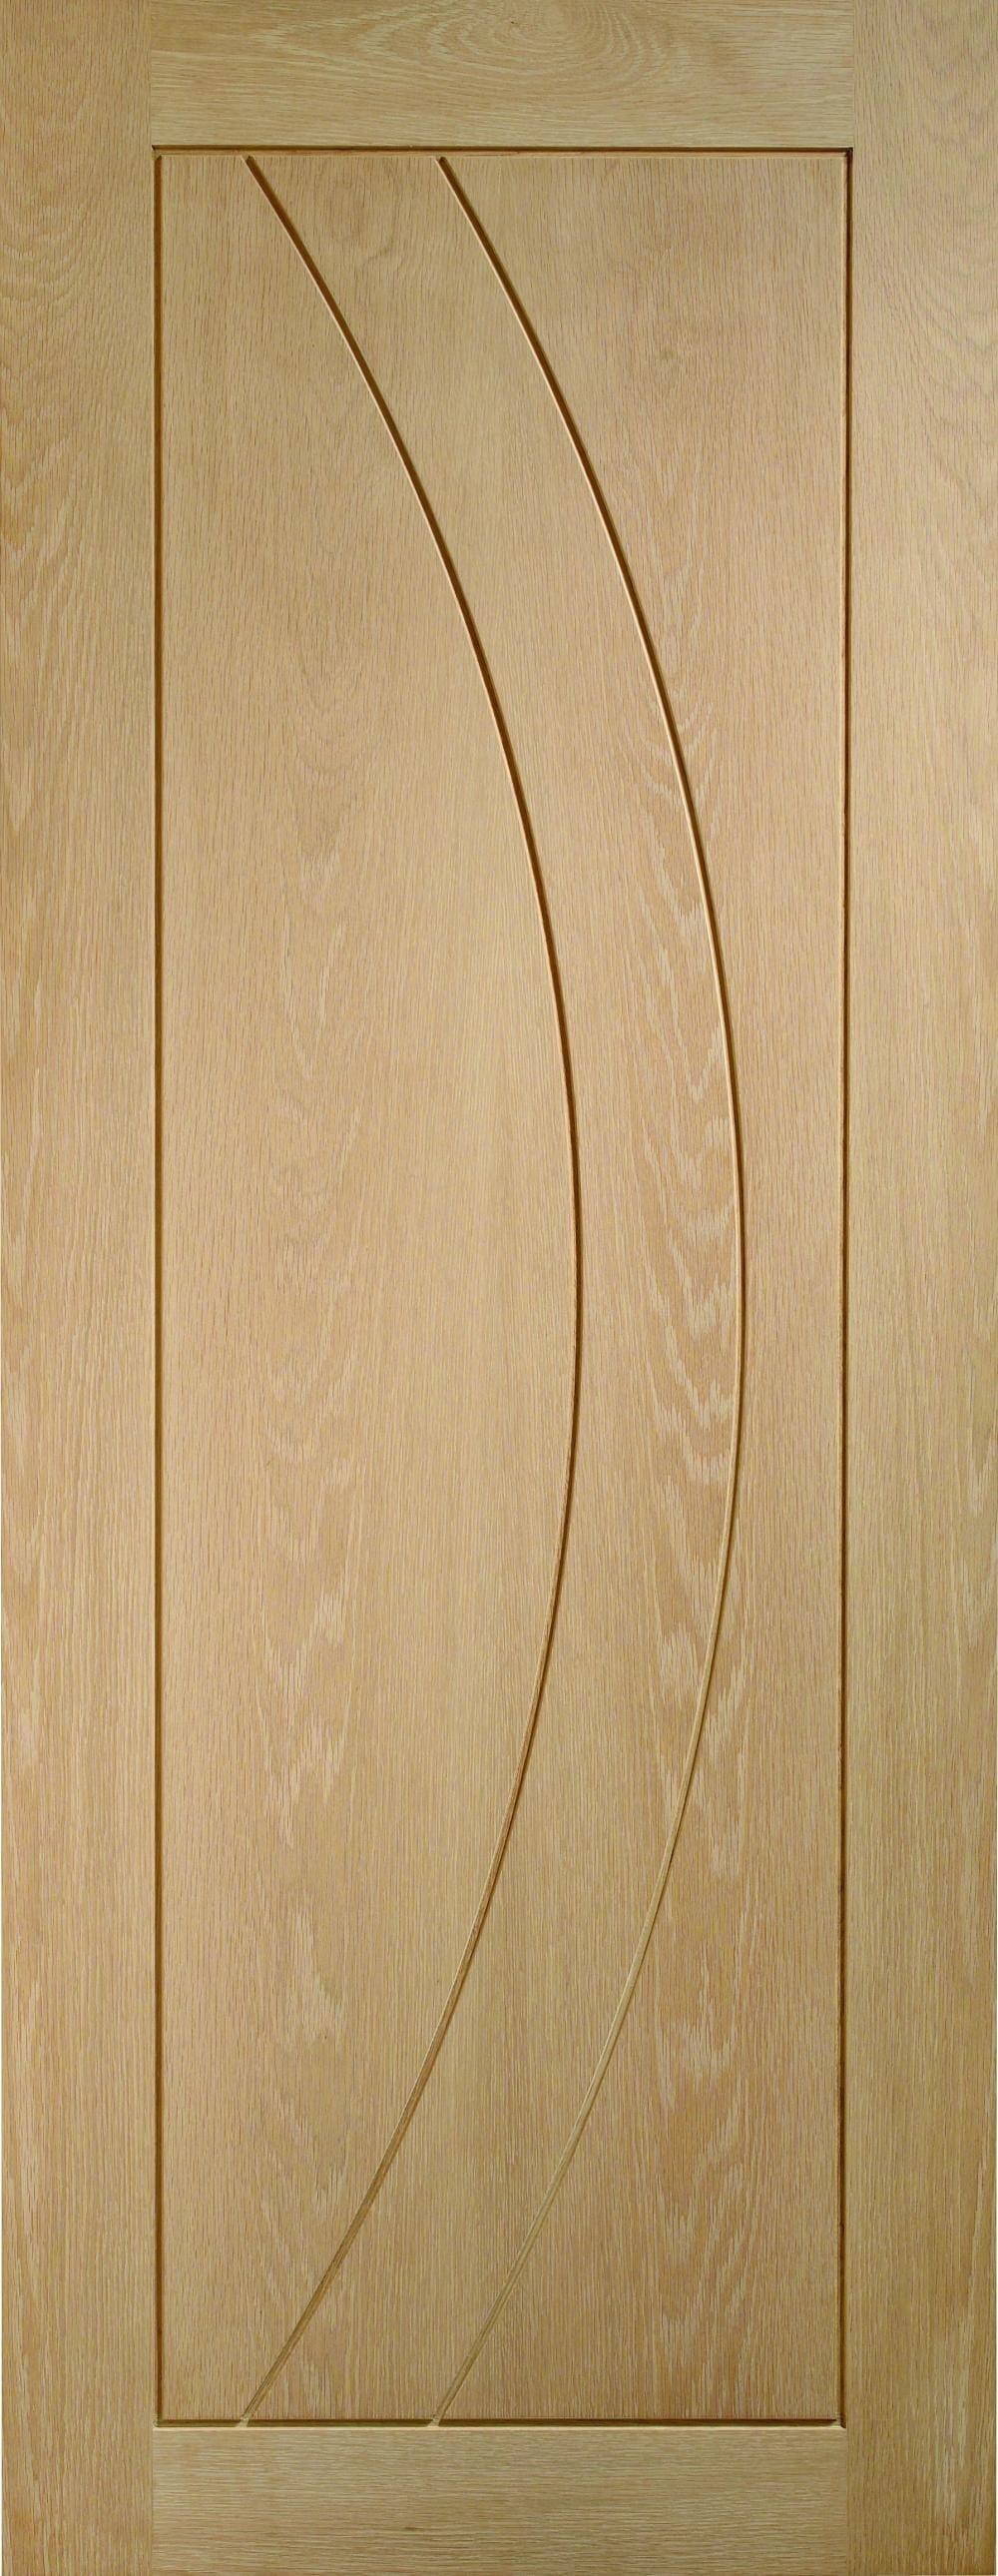 Salerno Oak Image